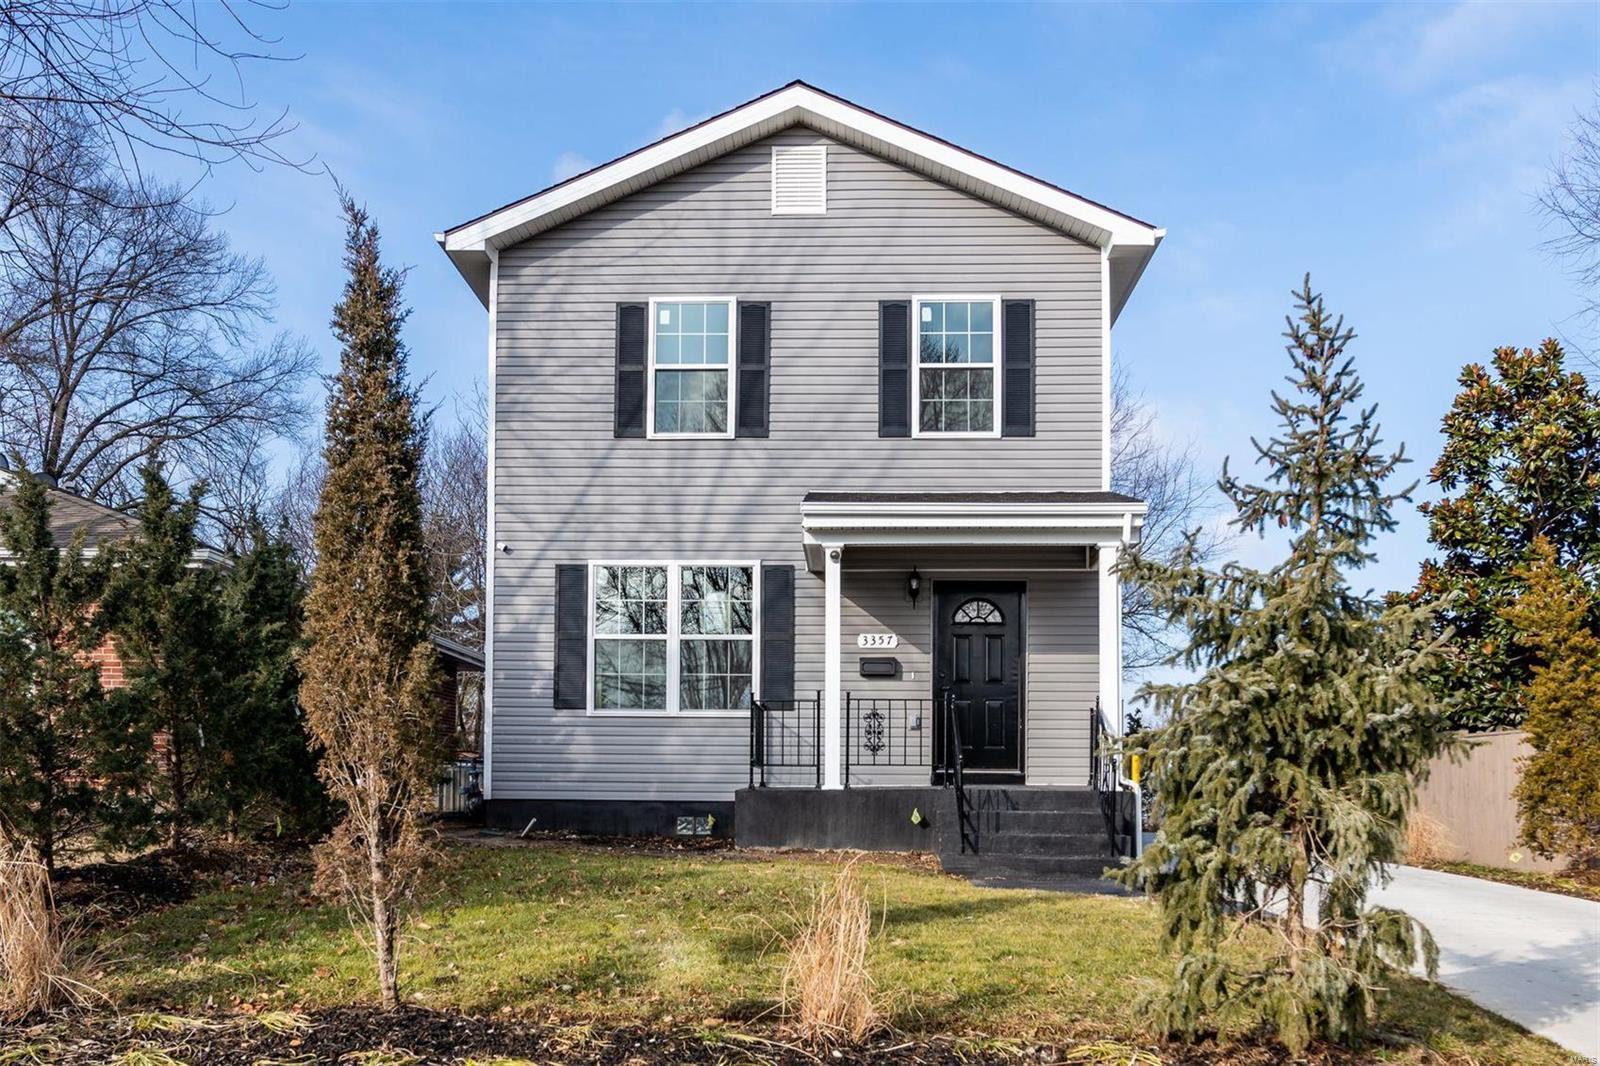 3357 Marshall Avenue Property Photo - St John, MO real estate listing